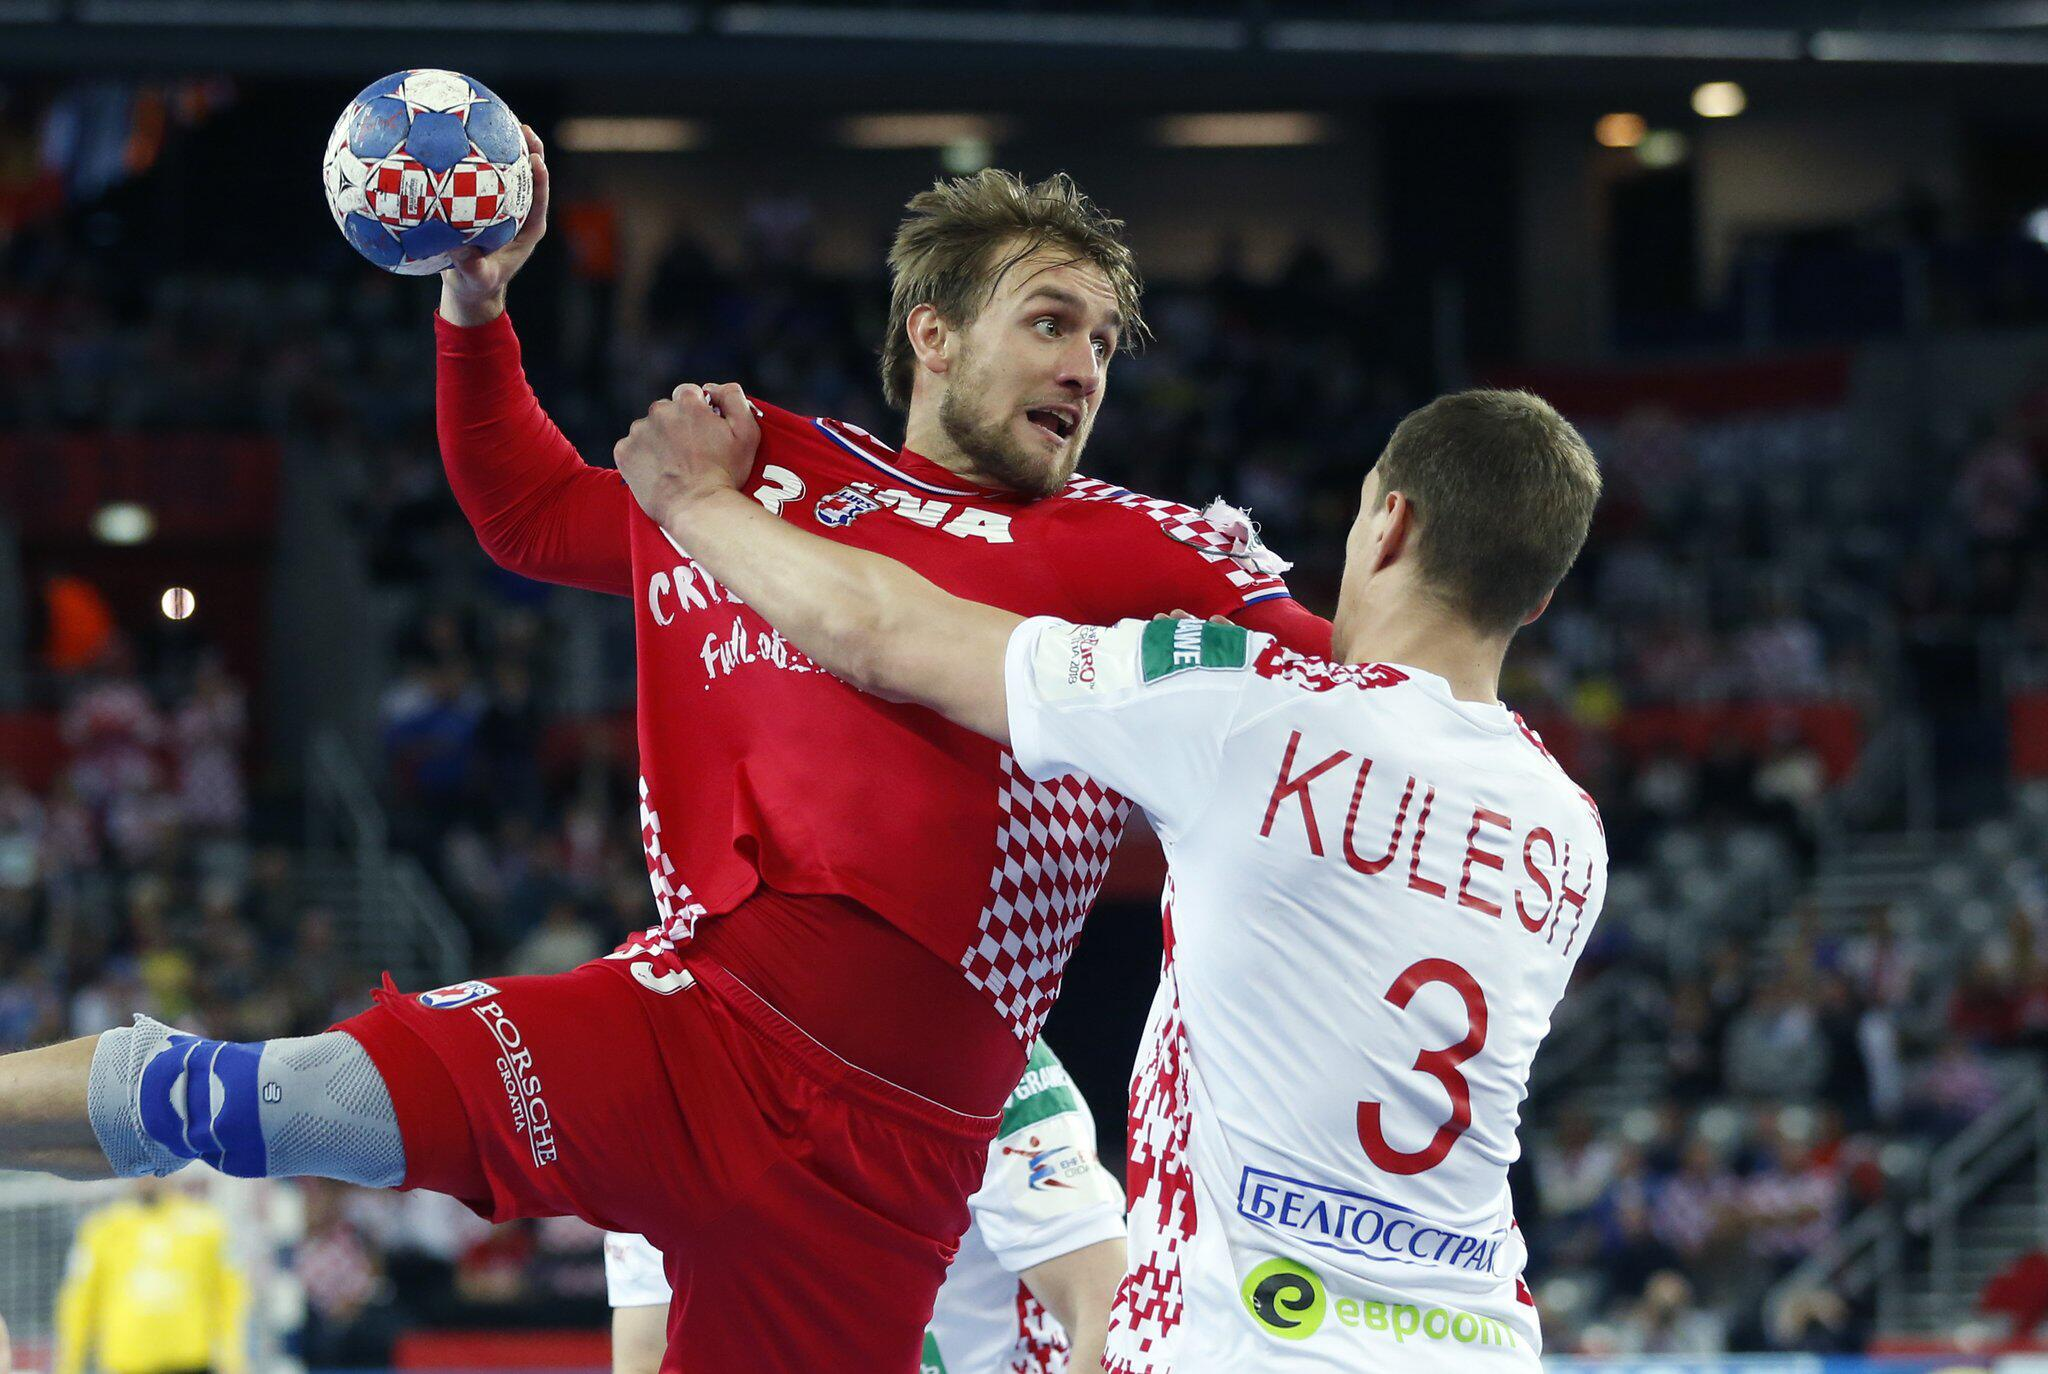 Bild zu Handball-EM: Kroatien - Weißrussland